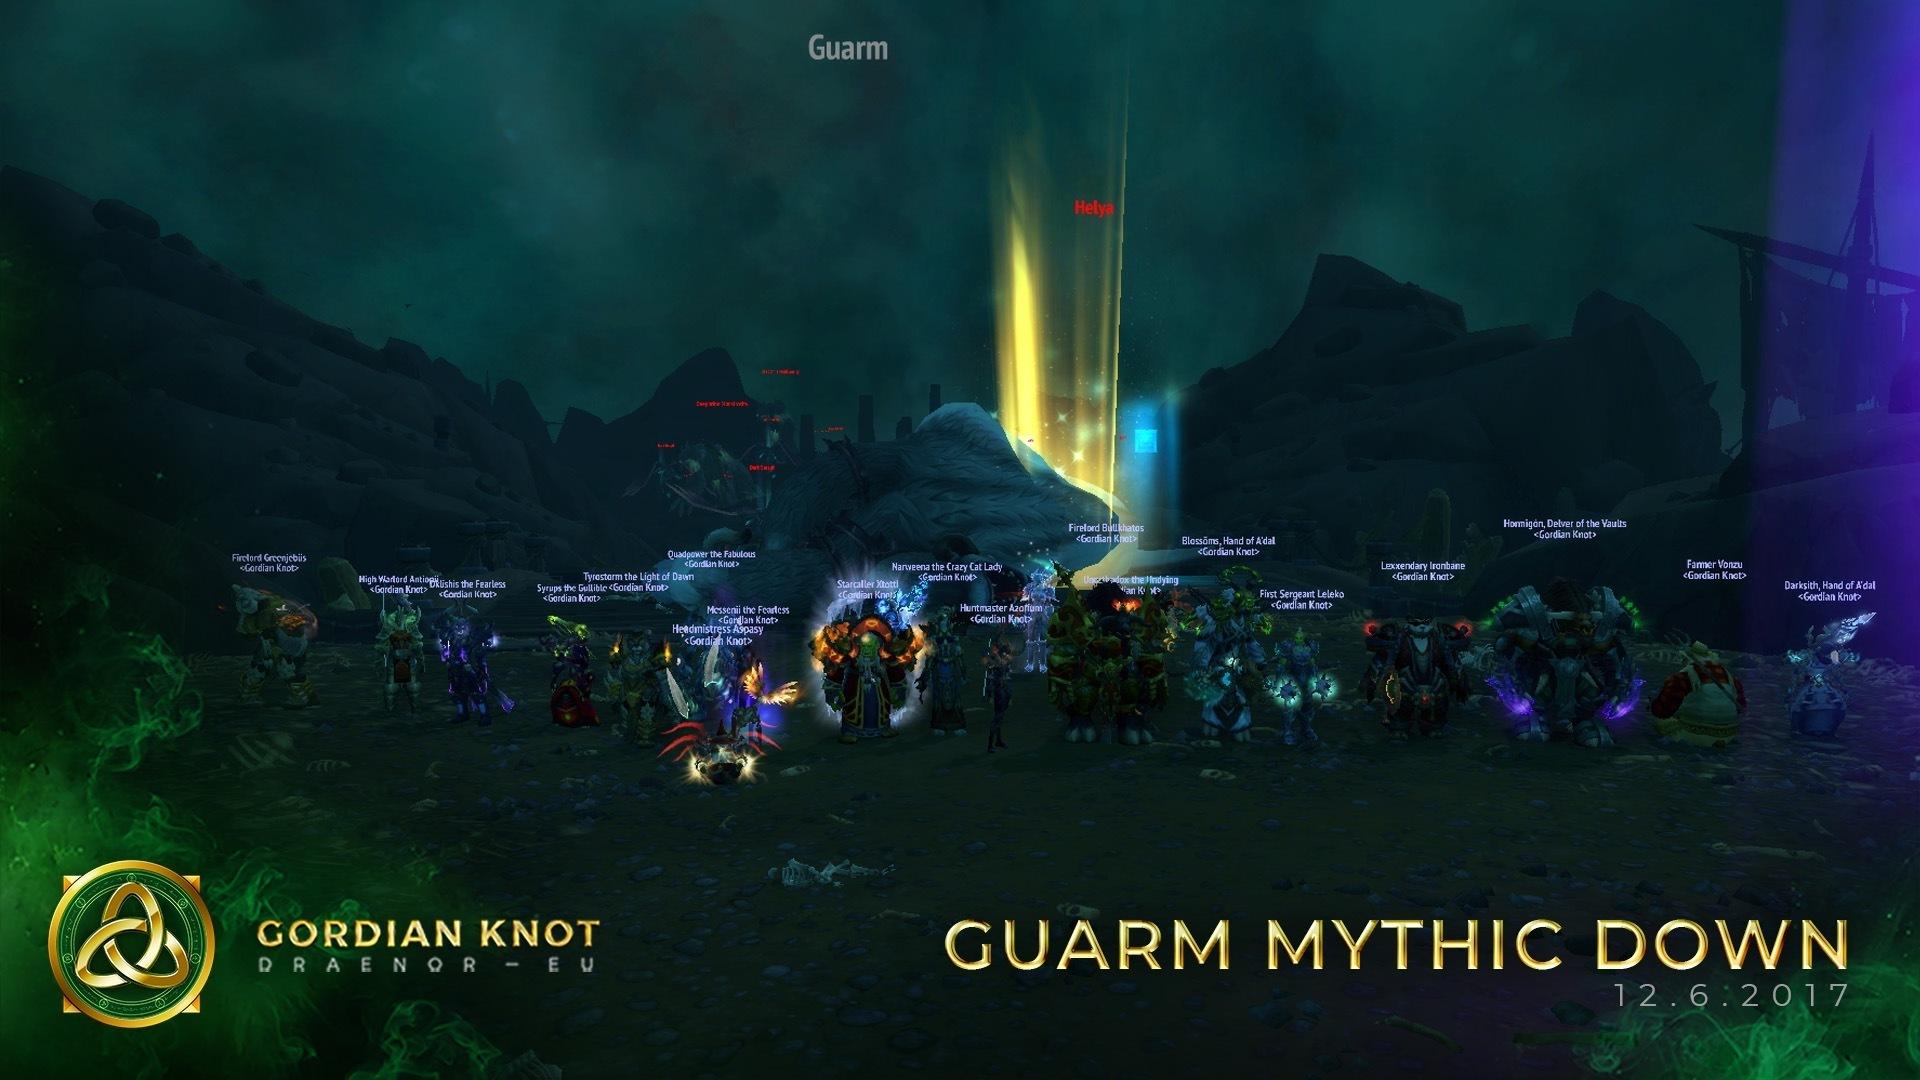 Guarm Mythic